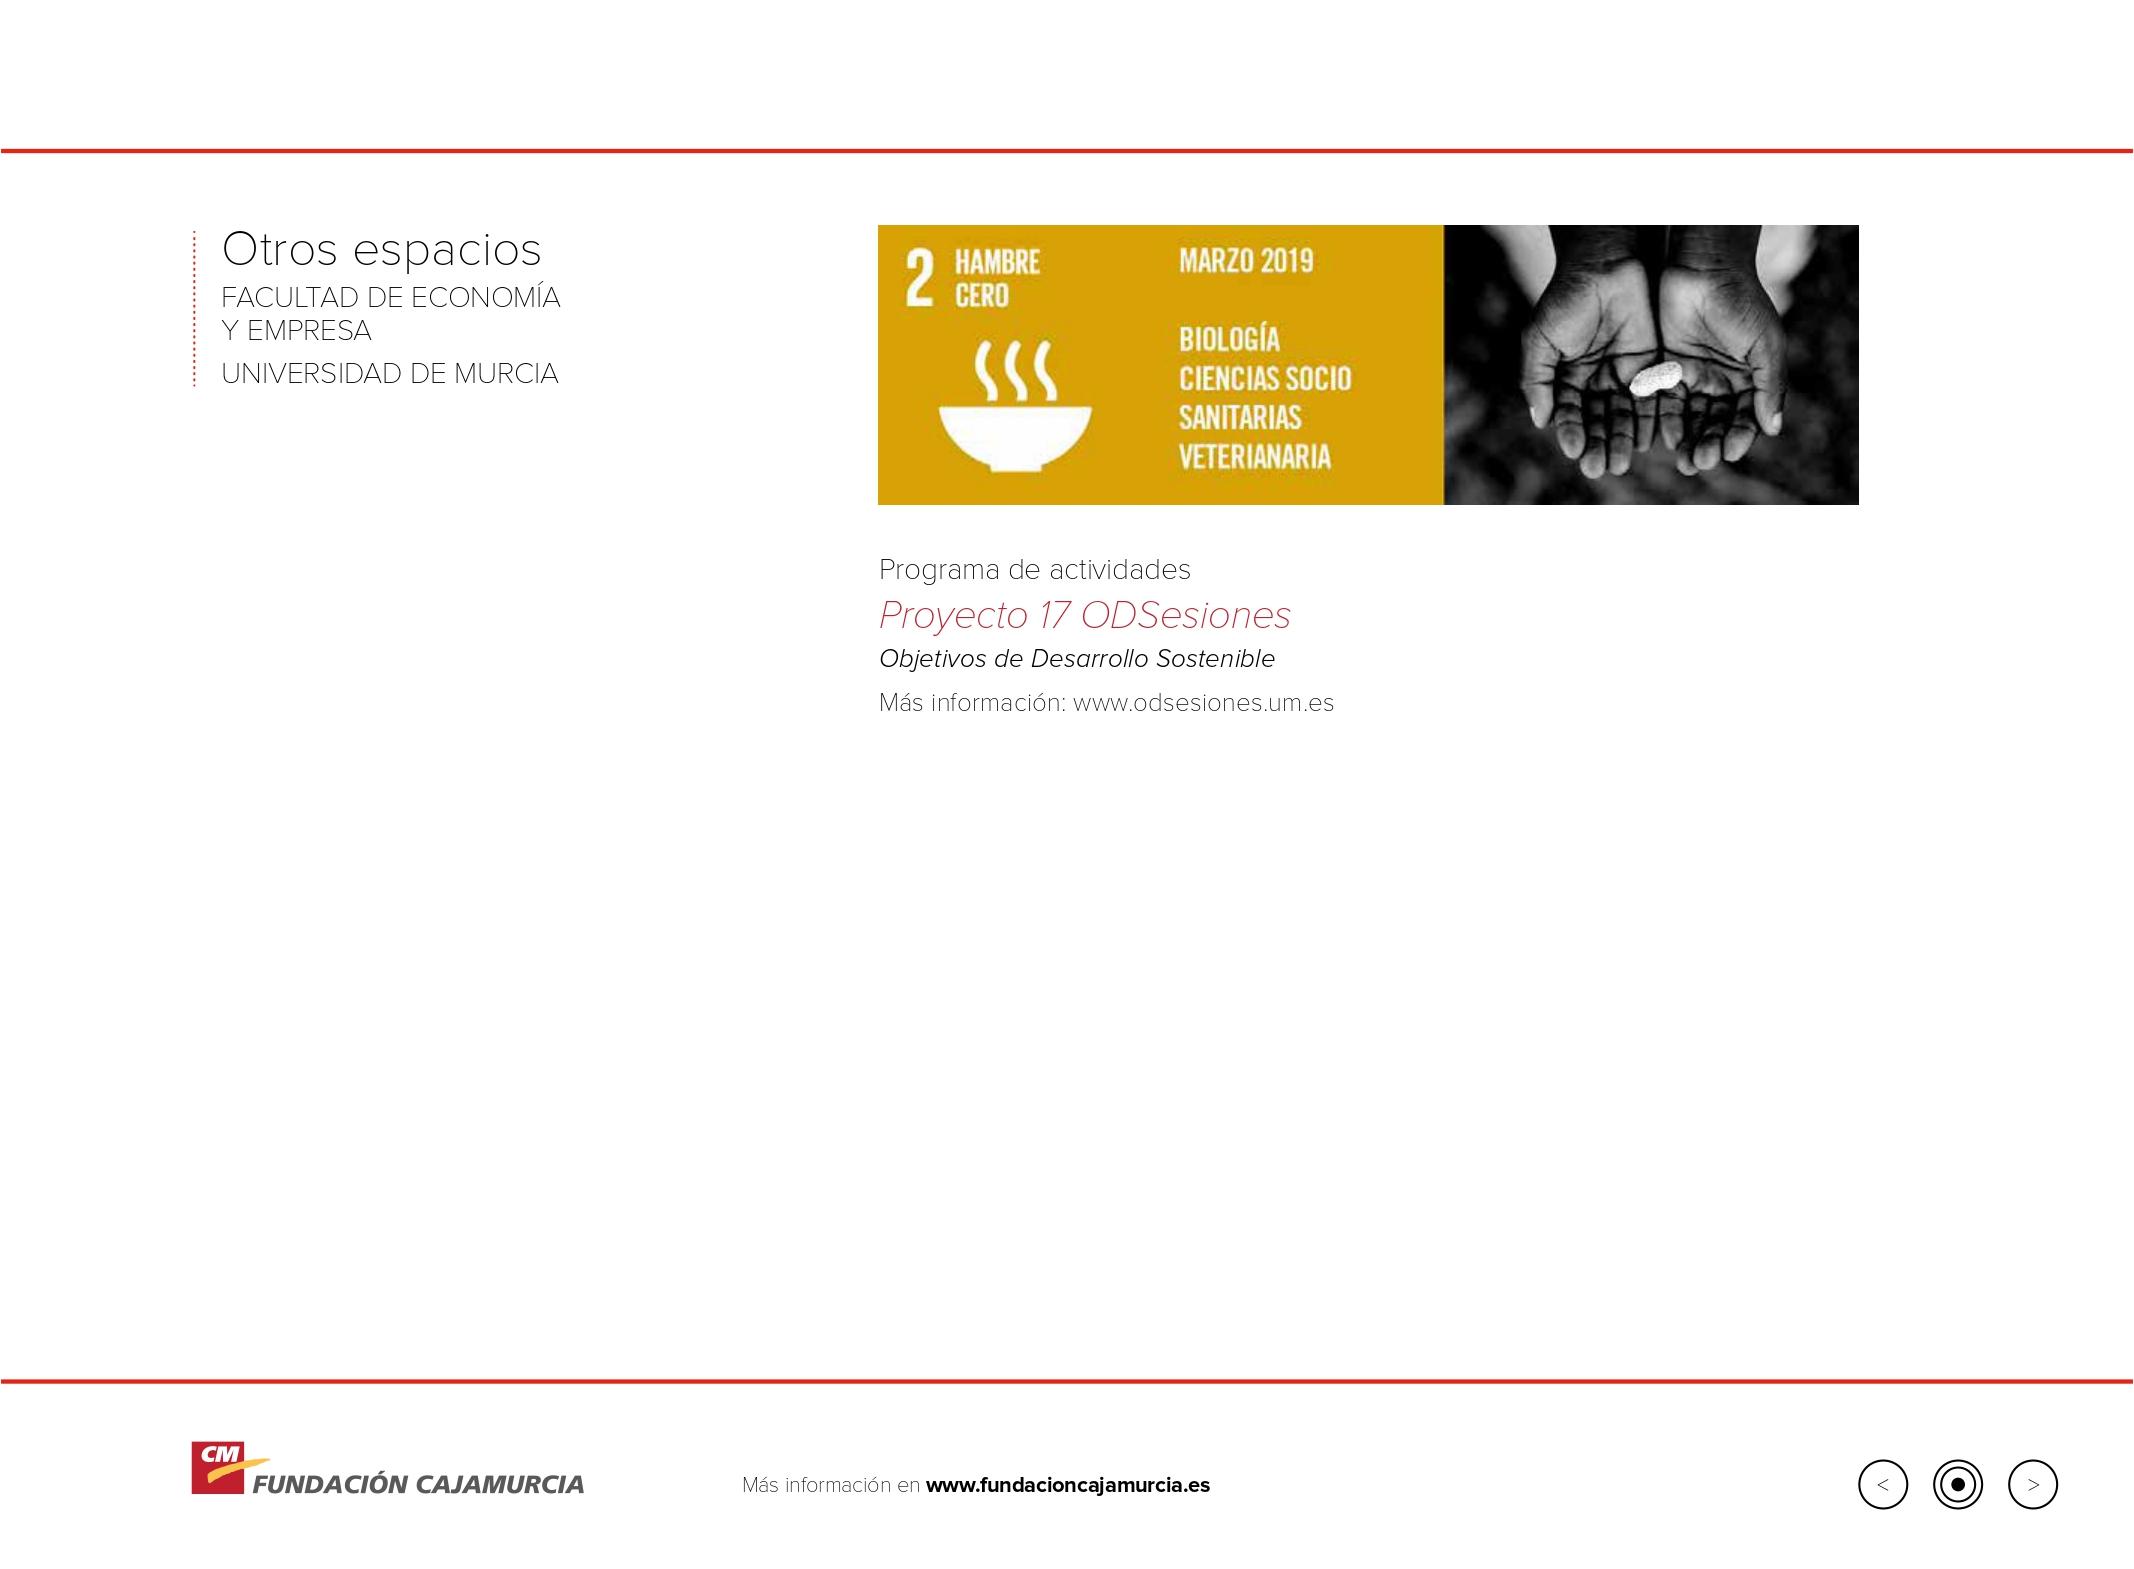 agenda-cajamurcia_page-0014.jpg